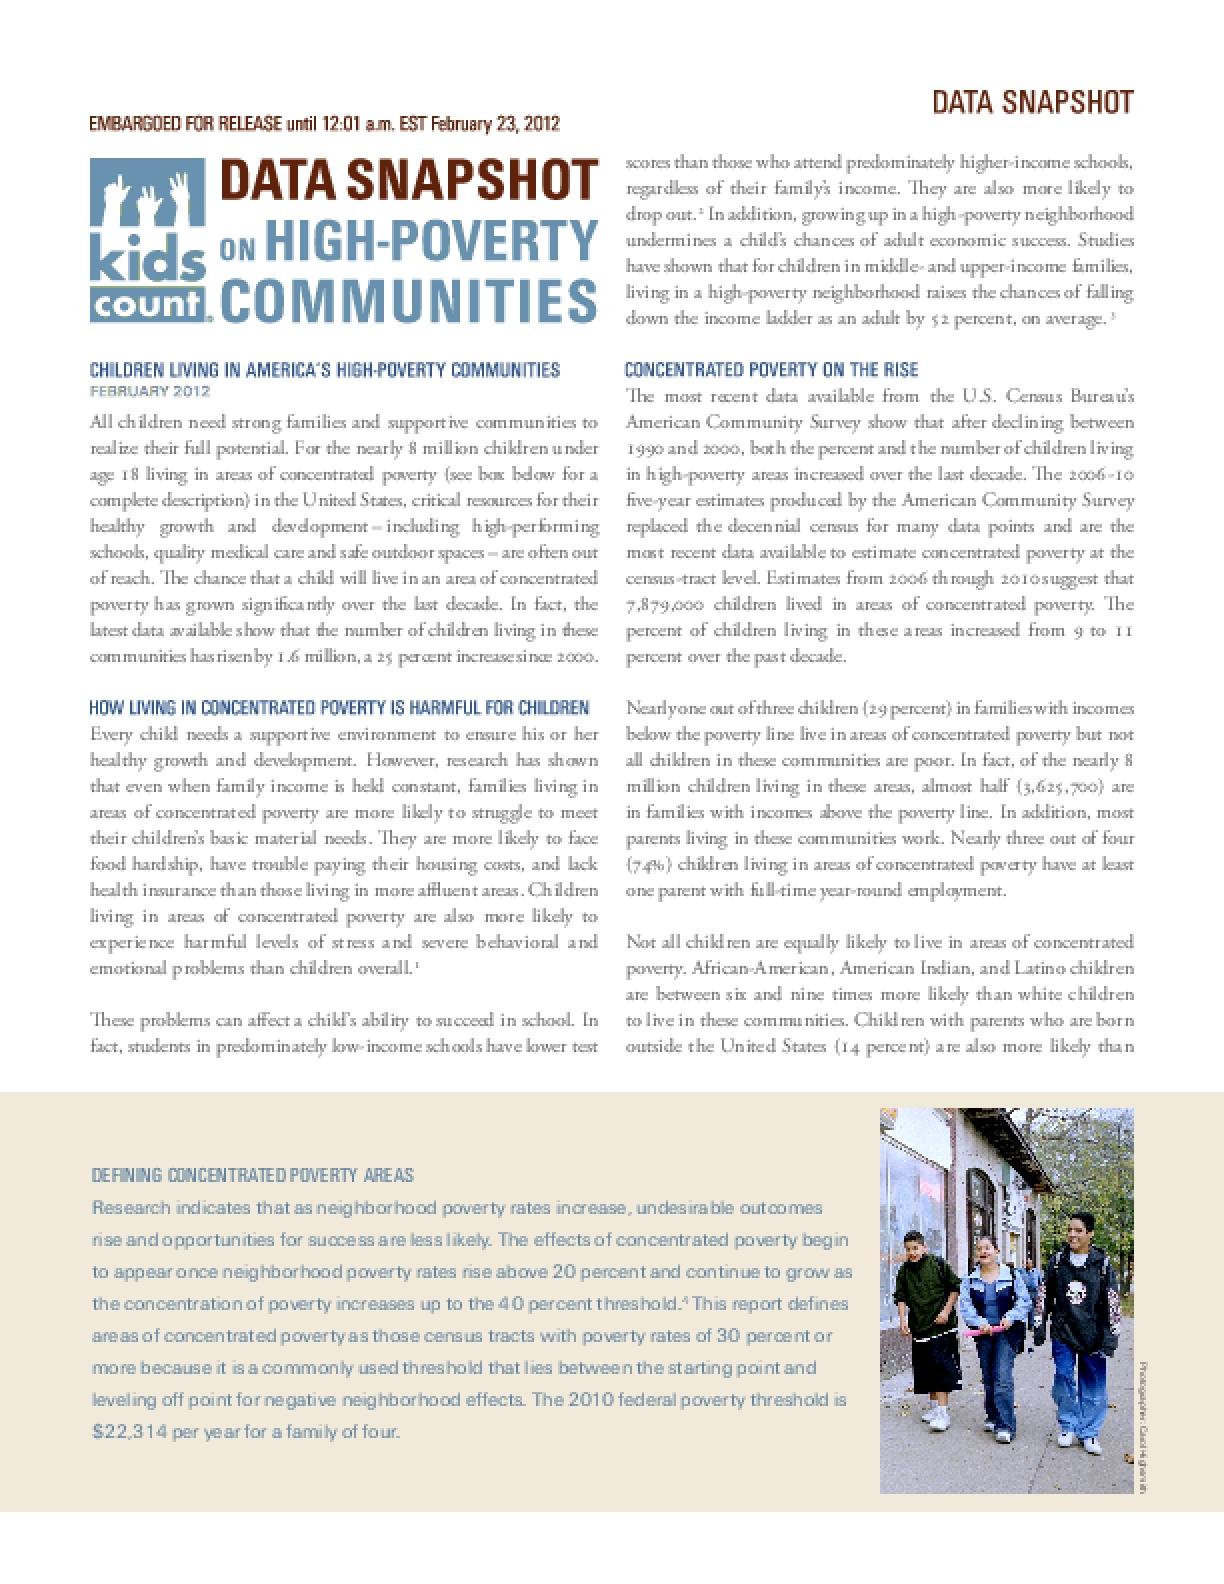 KIDS COUNT Data Snapshot on Children Living in High-Poverty Communities